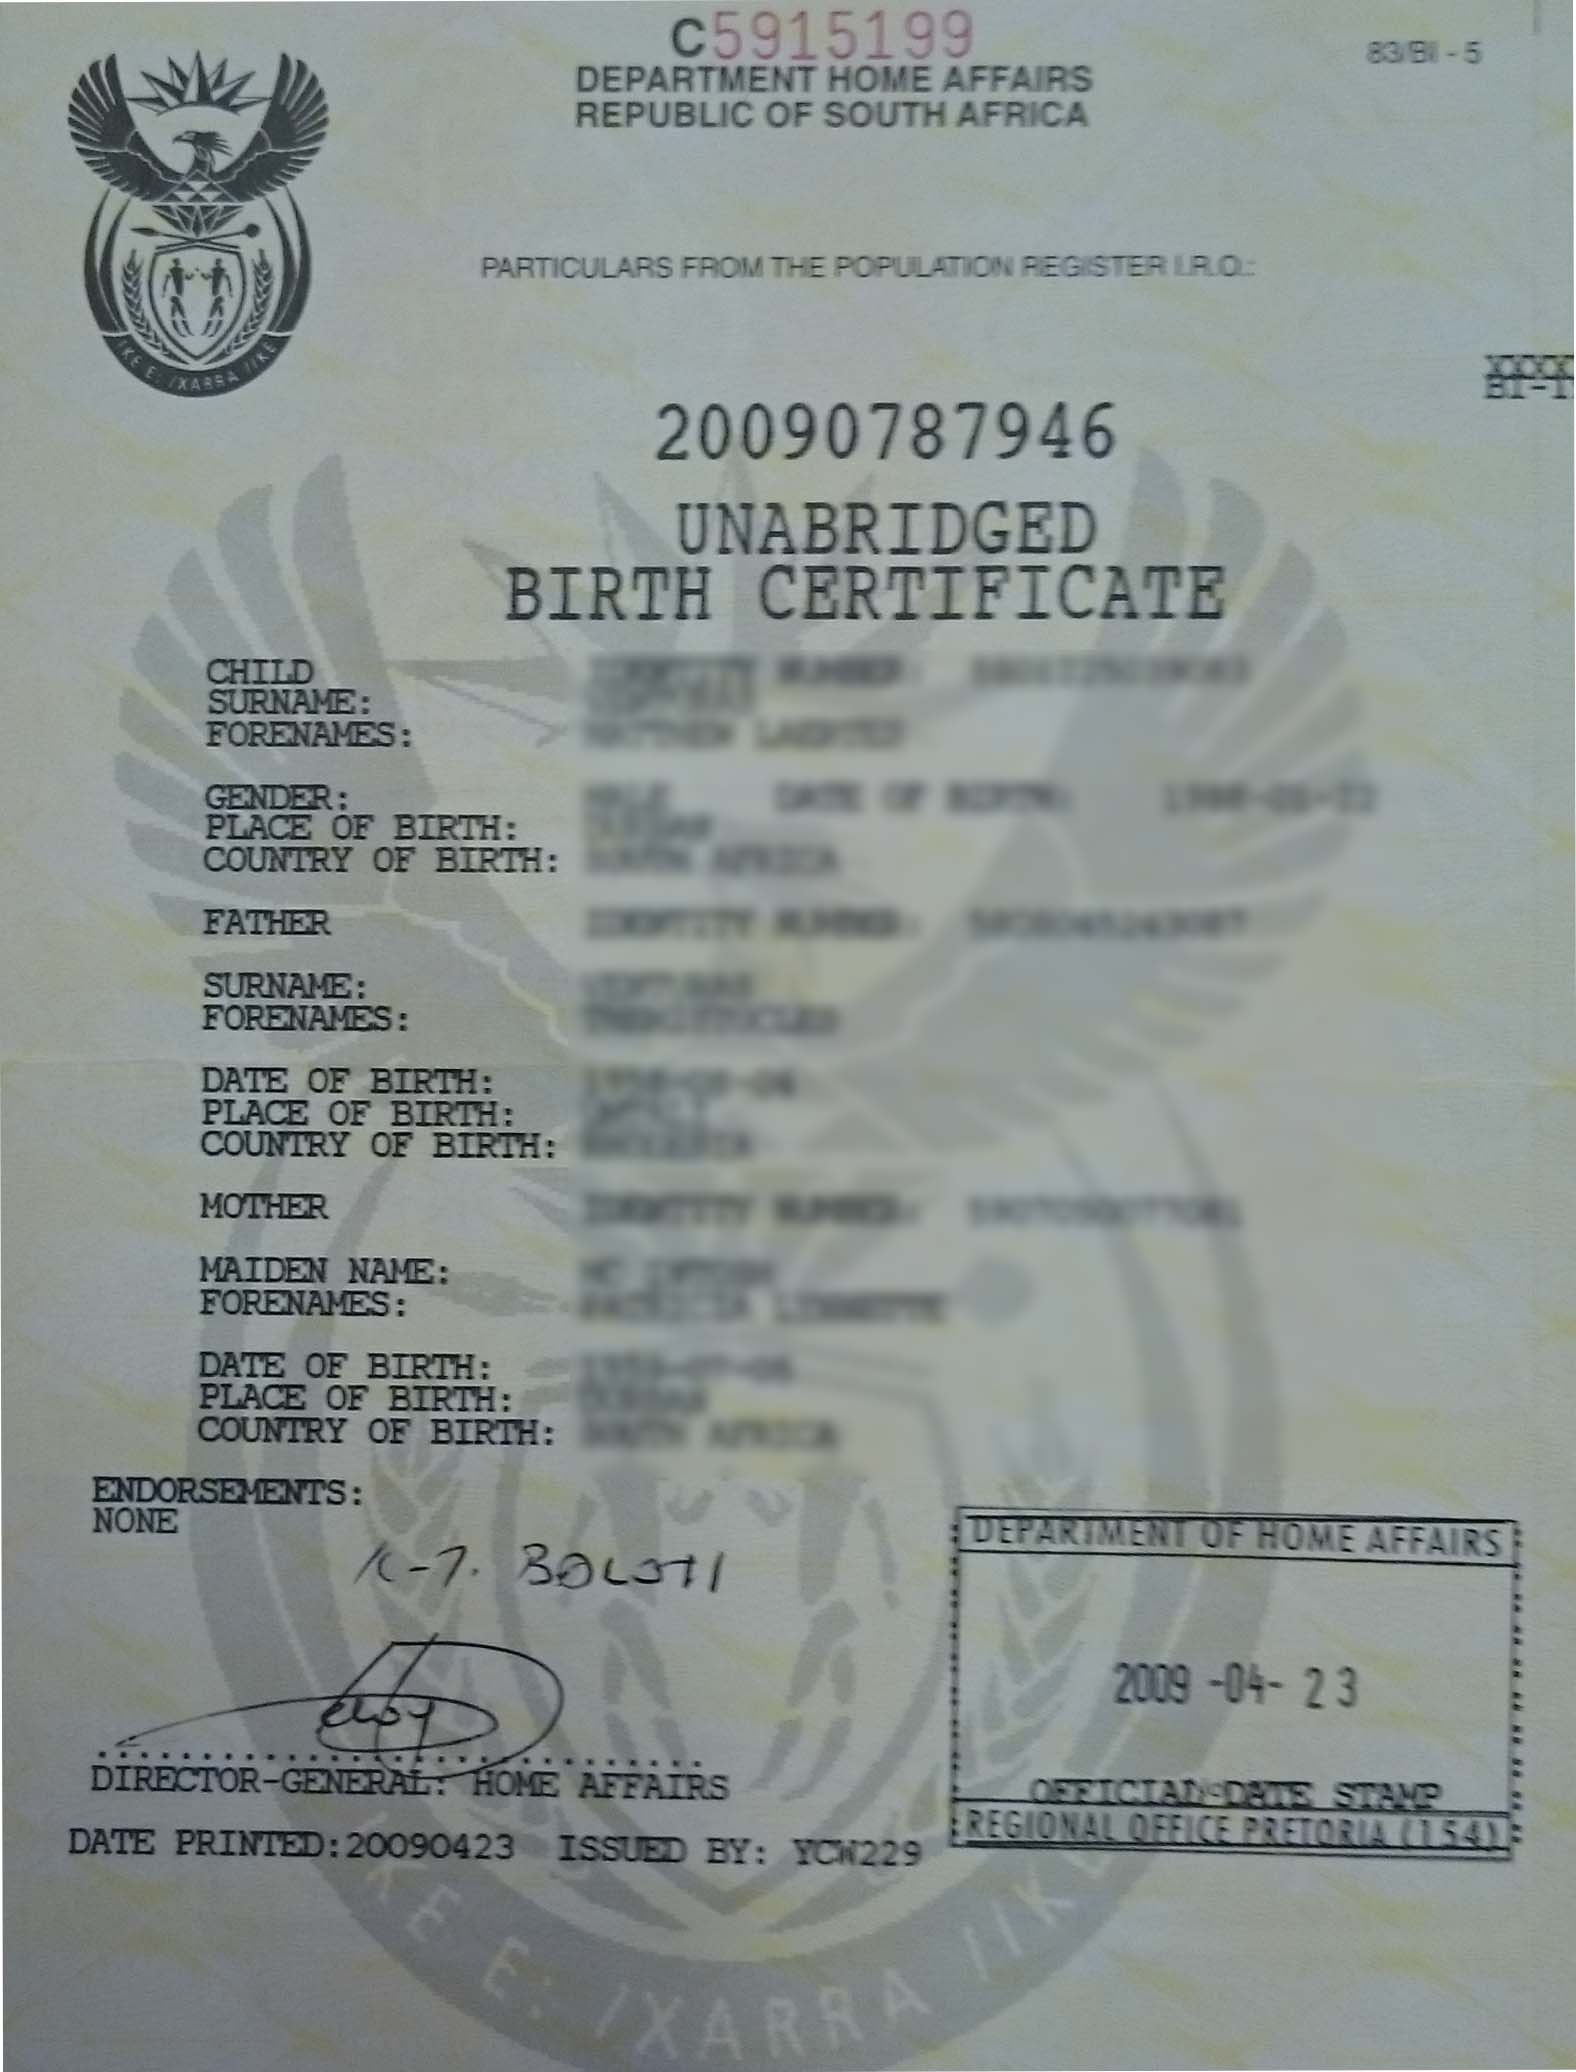 Unabridged birth certificate savisas unabridged birth certificate aiddatafo Gallery